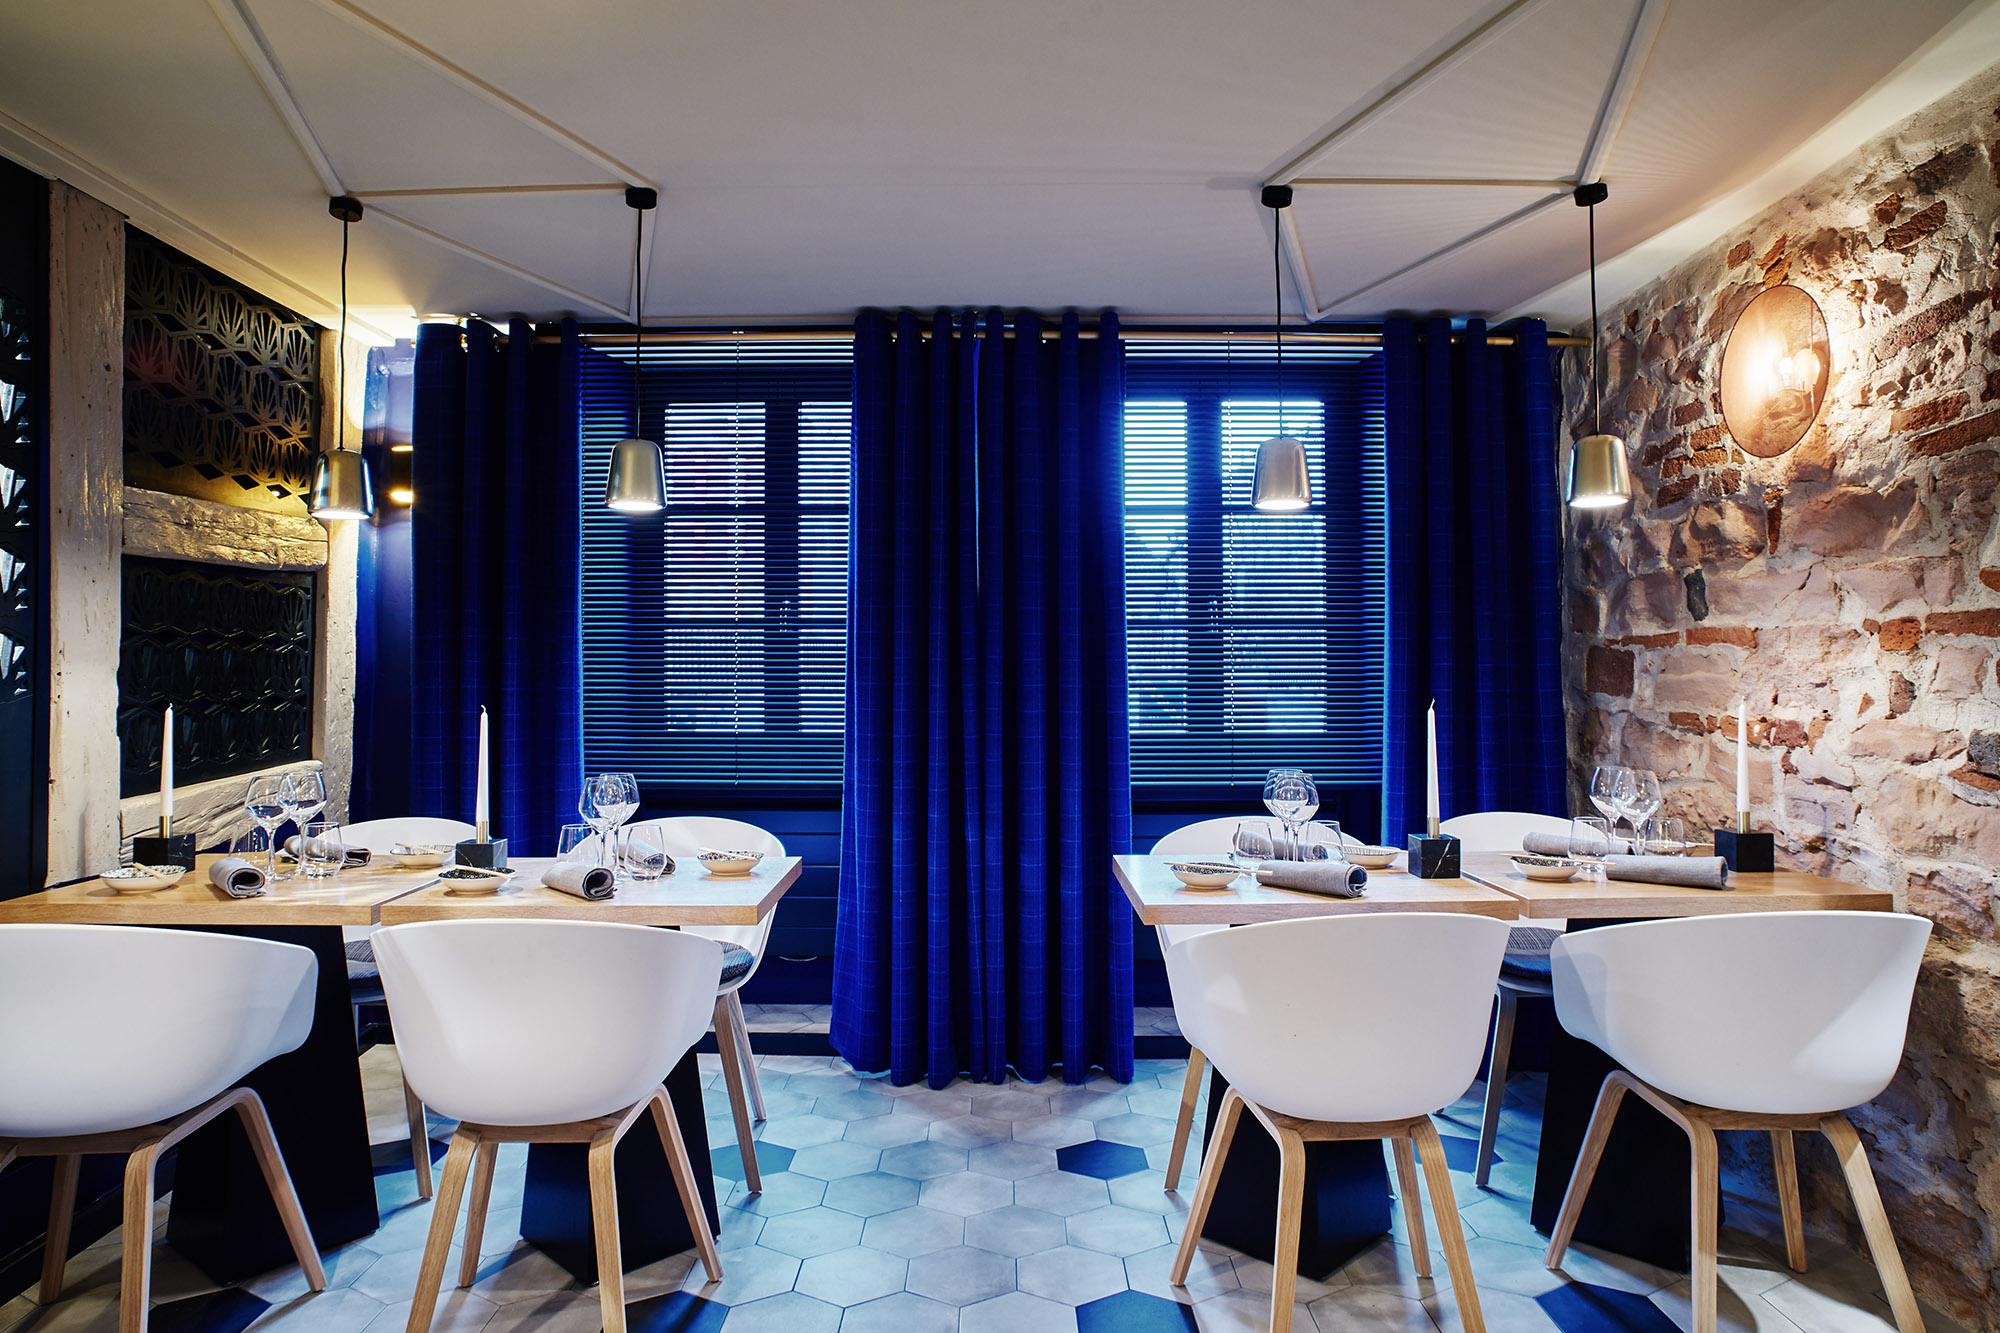 le-frichtis-restaurant-01